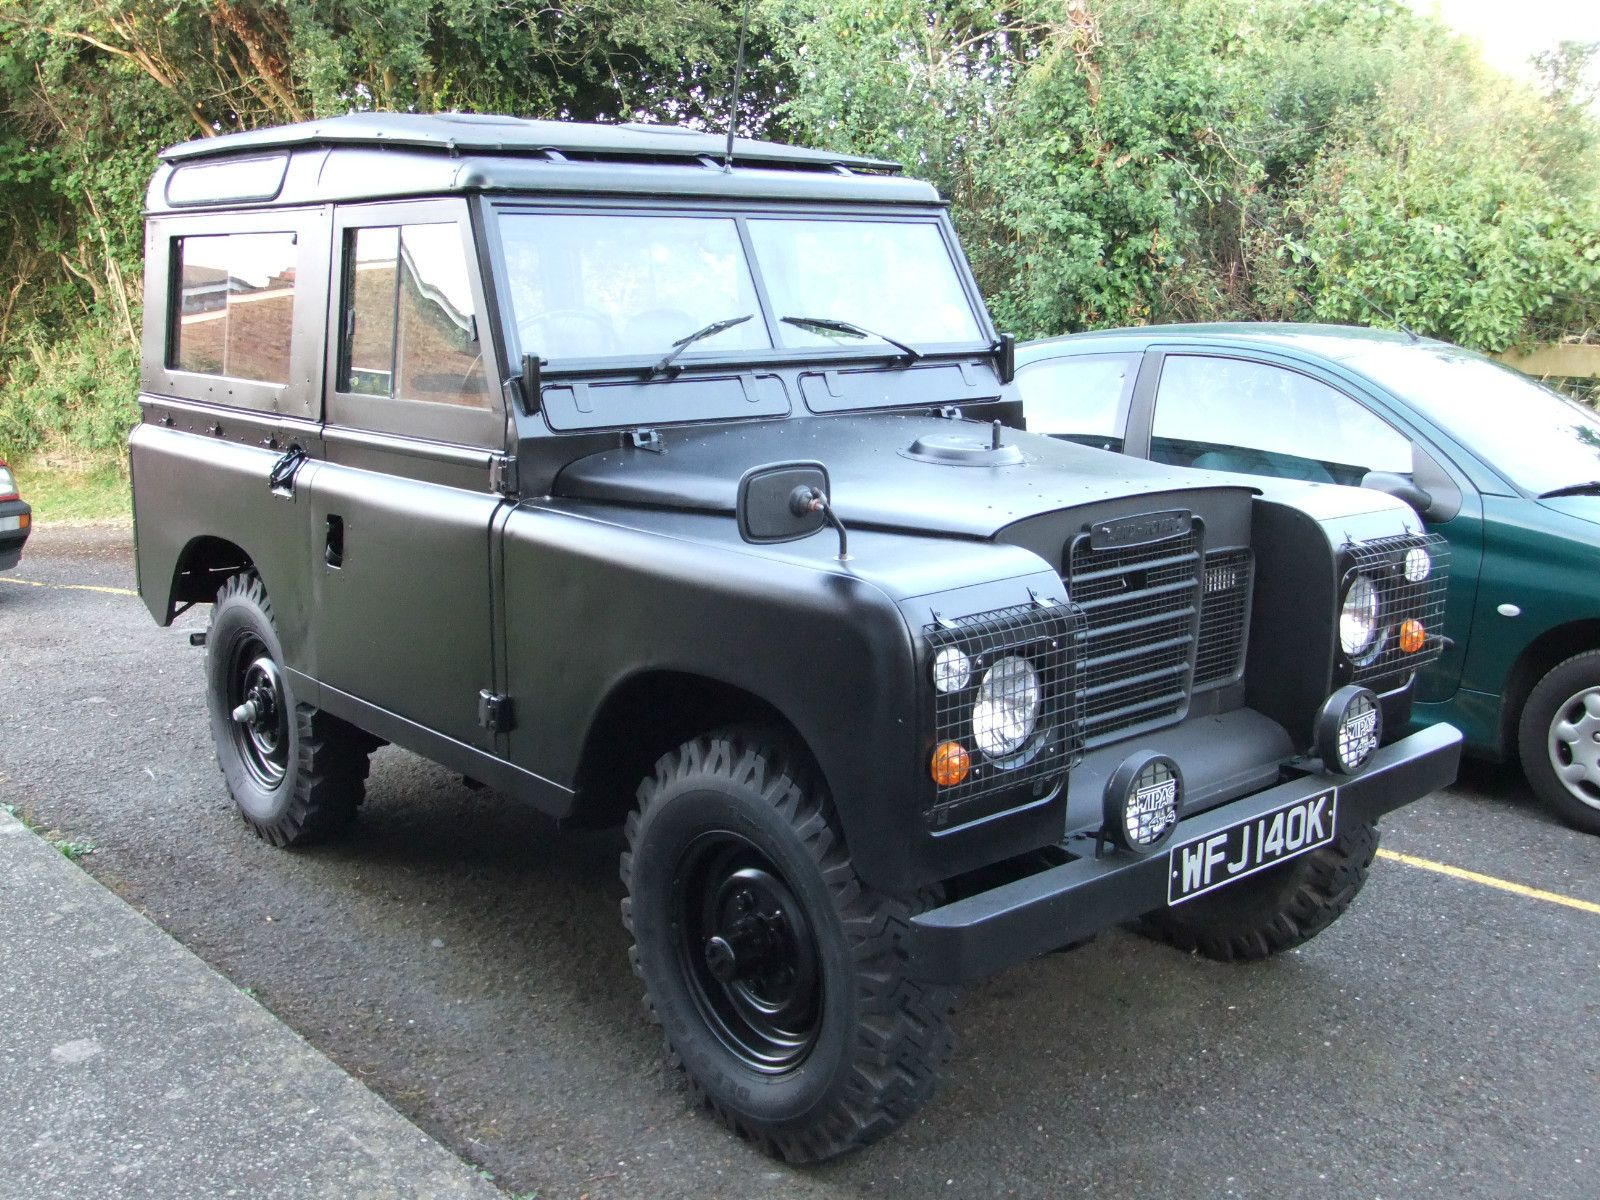 Matte Black Land Rover Series Land Rover Land Rover Defender